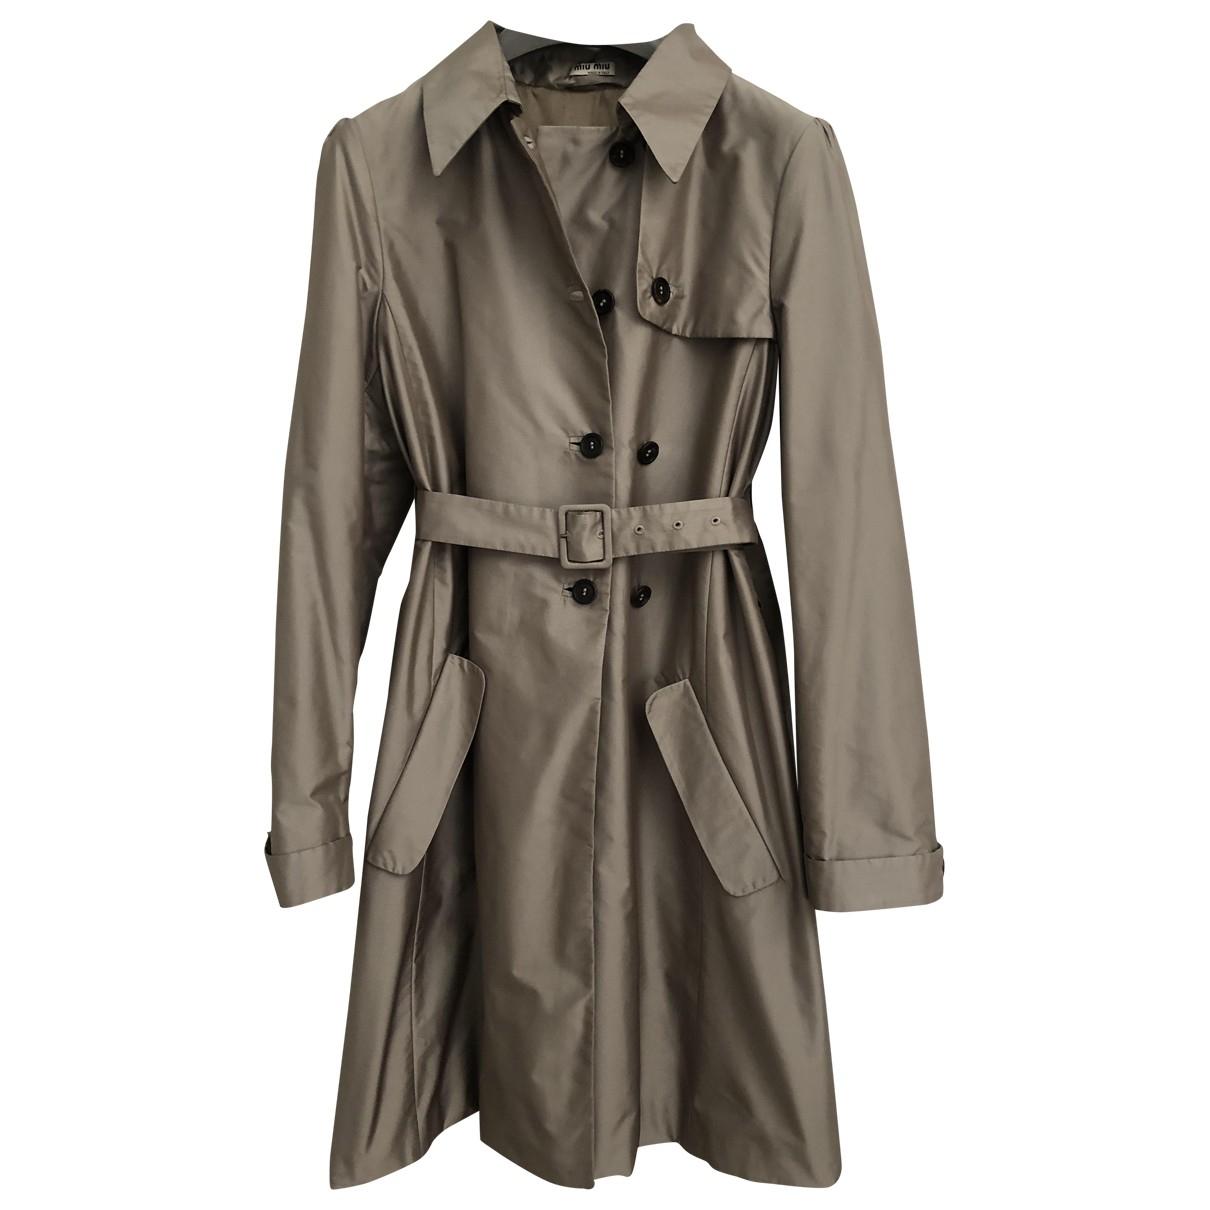 Miu Miu \N Grey Trench coat for Women 42 IT